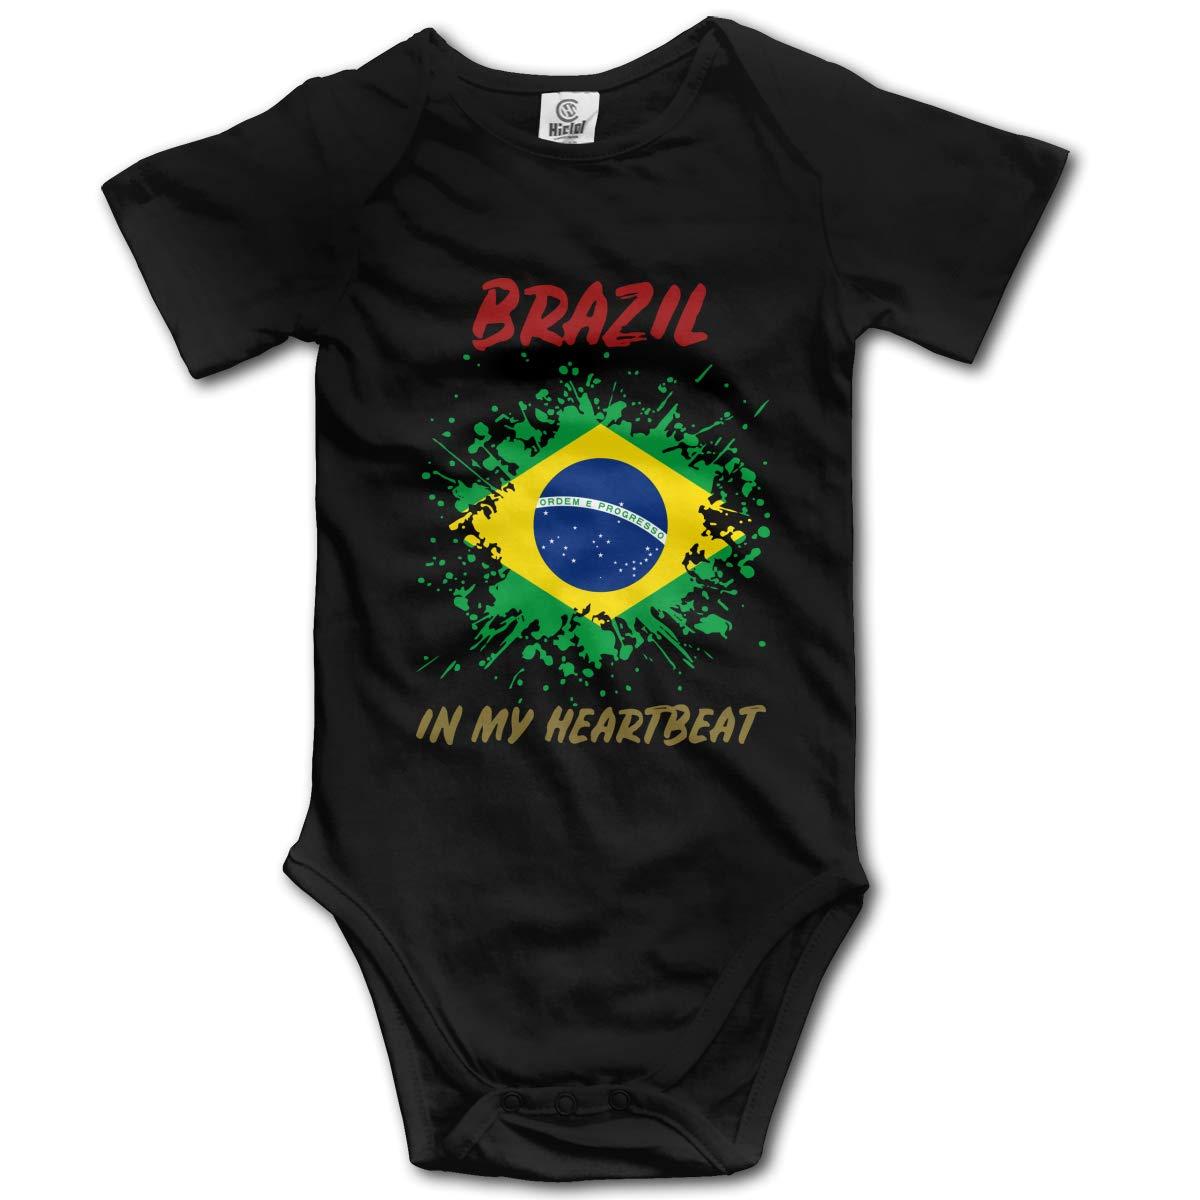 Brazil in My Heartbeat Unisex Solid Baby 100/% Organic Cotton Layette Bodysuit 0-2T